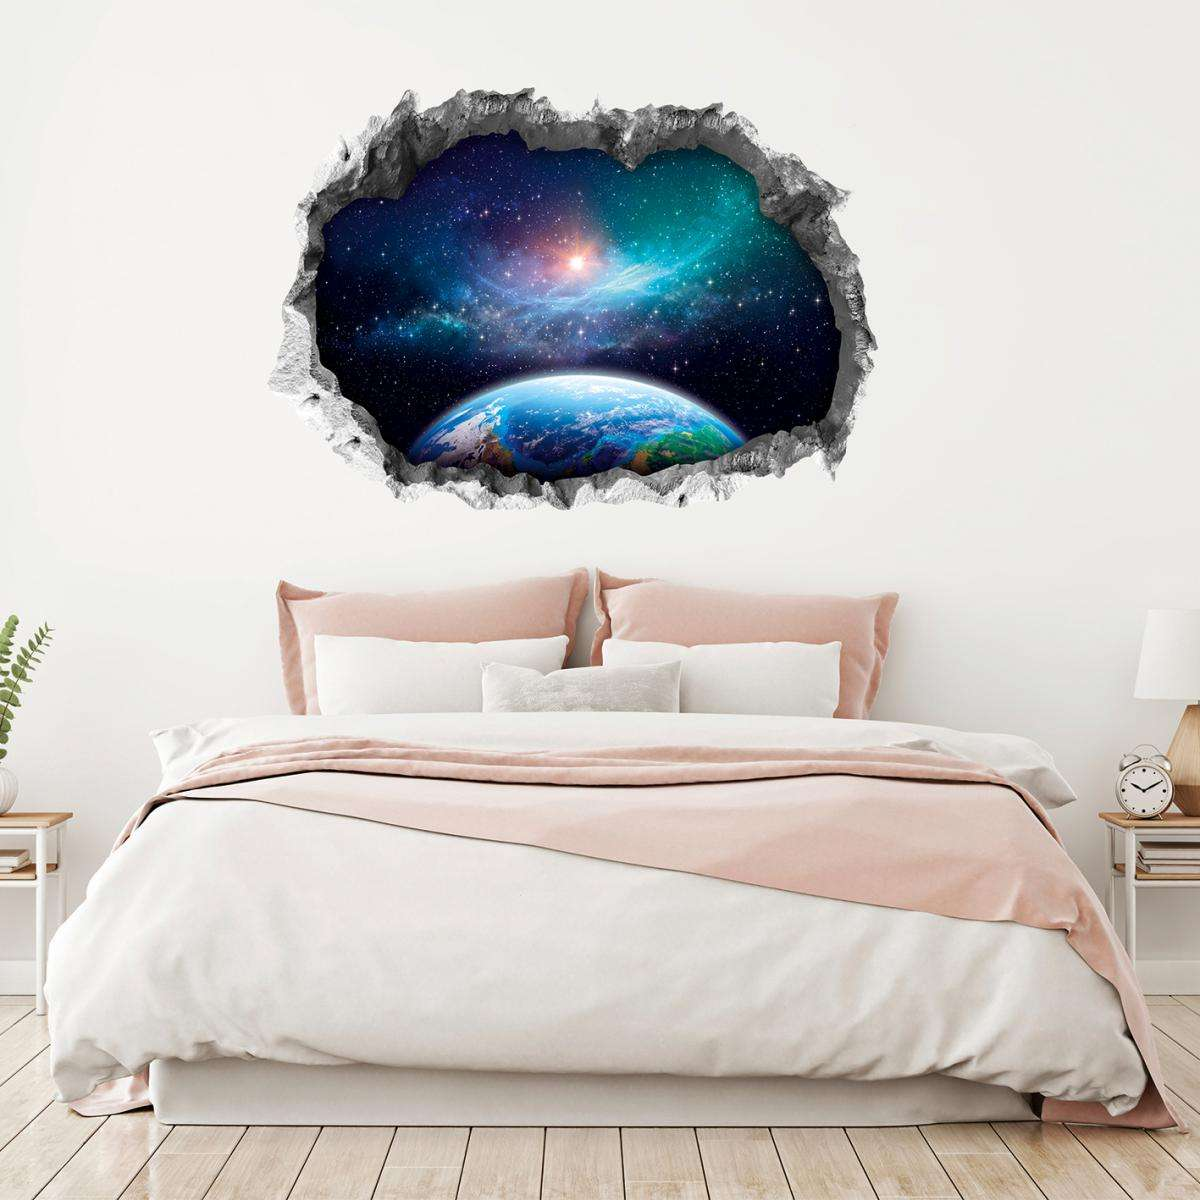 Easymaxx Wandtattoo 3D Galaxy mehrfarbig